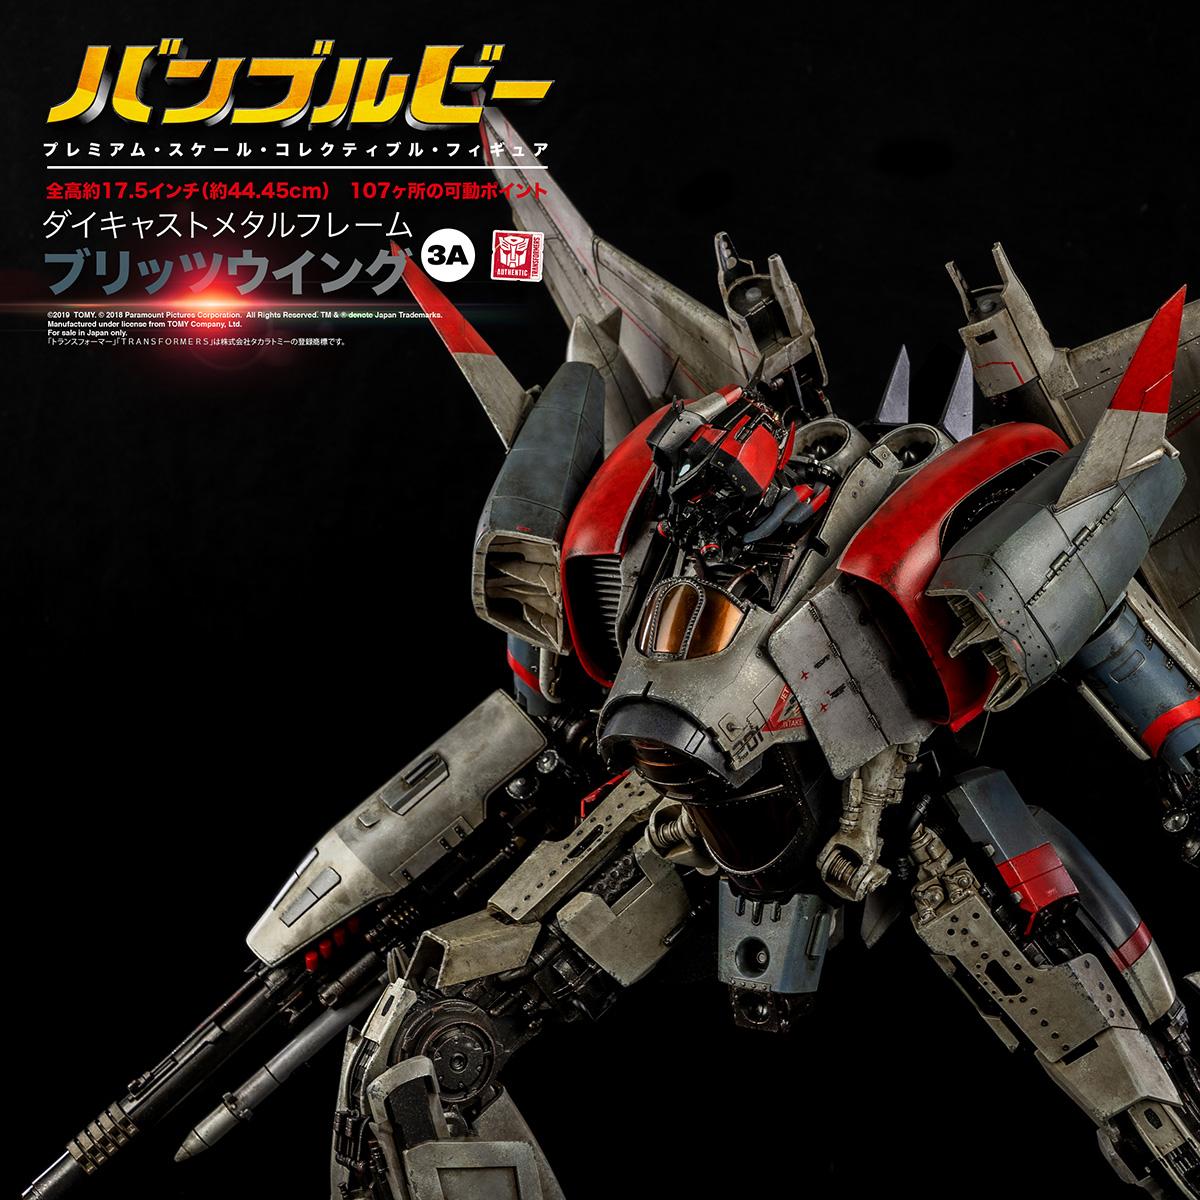 Blitzwing_PM_JAP_1047.jpg